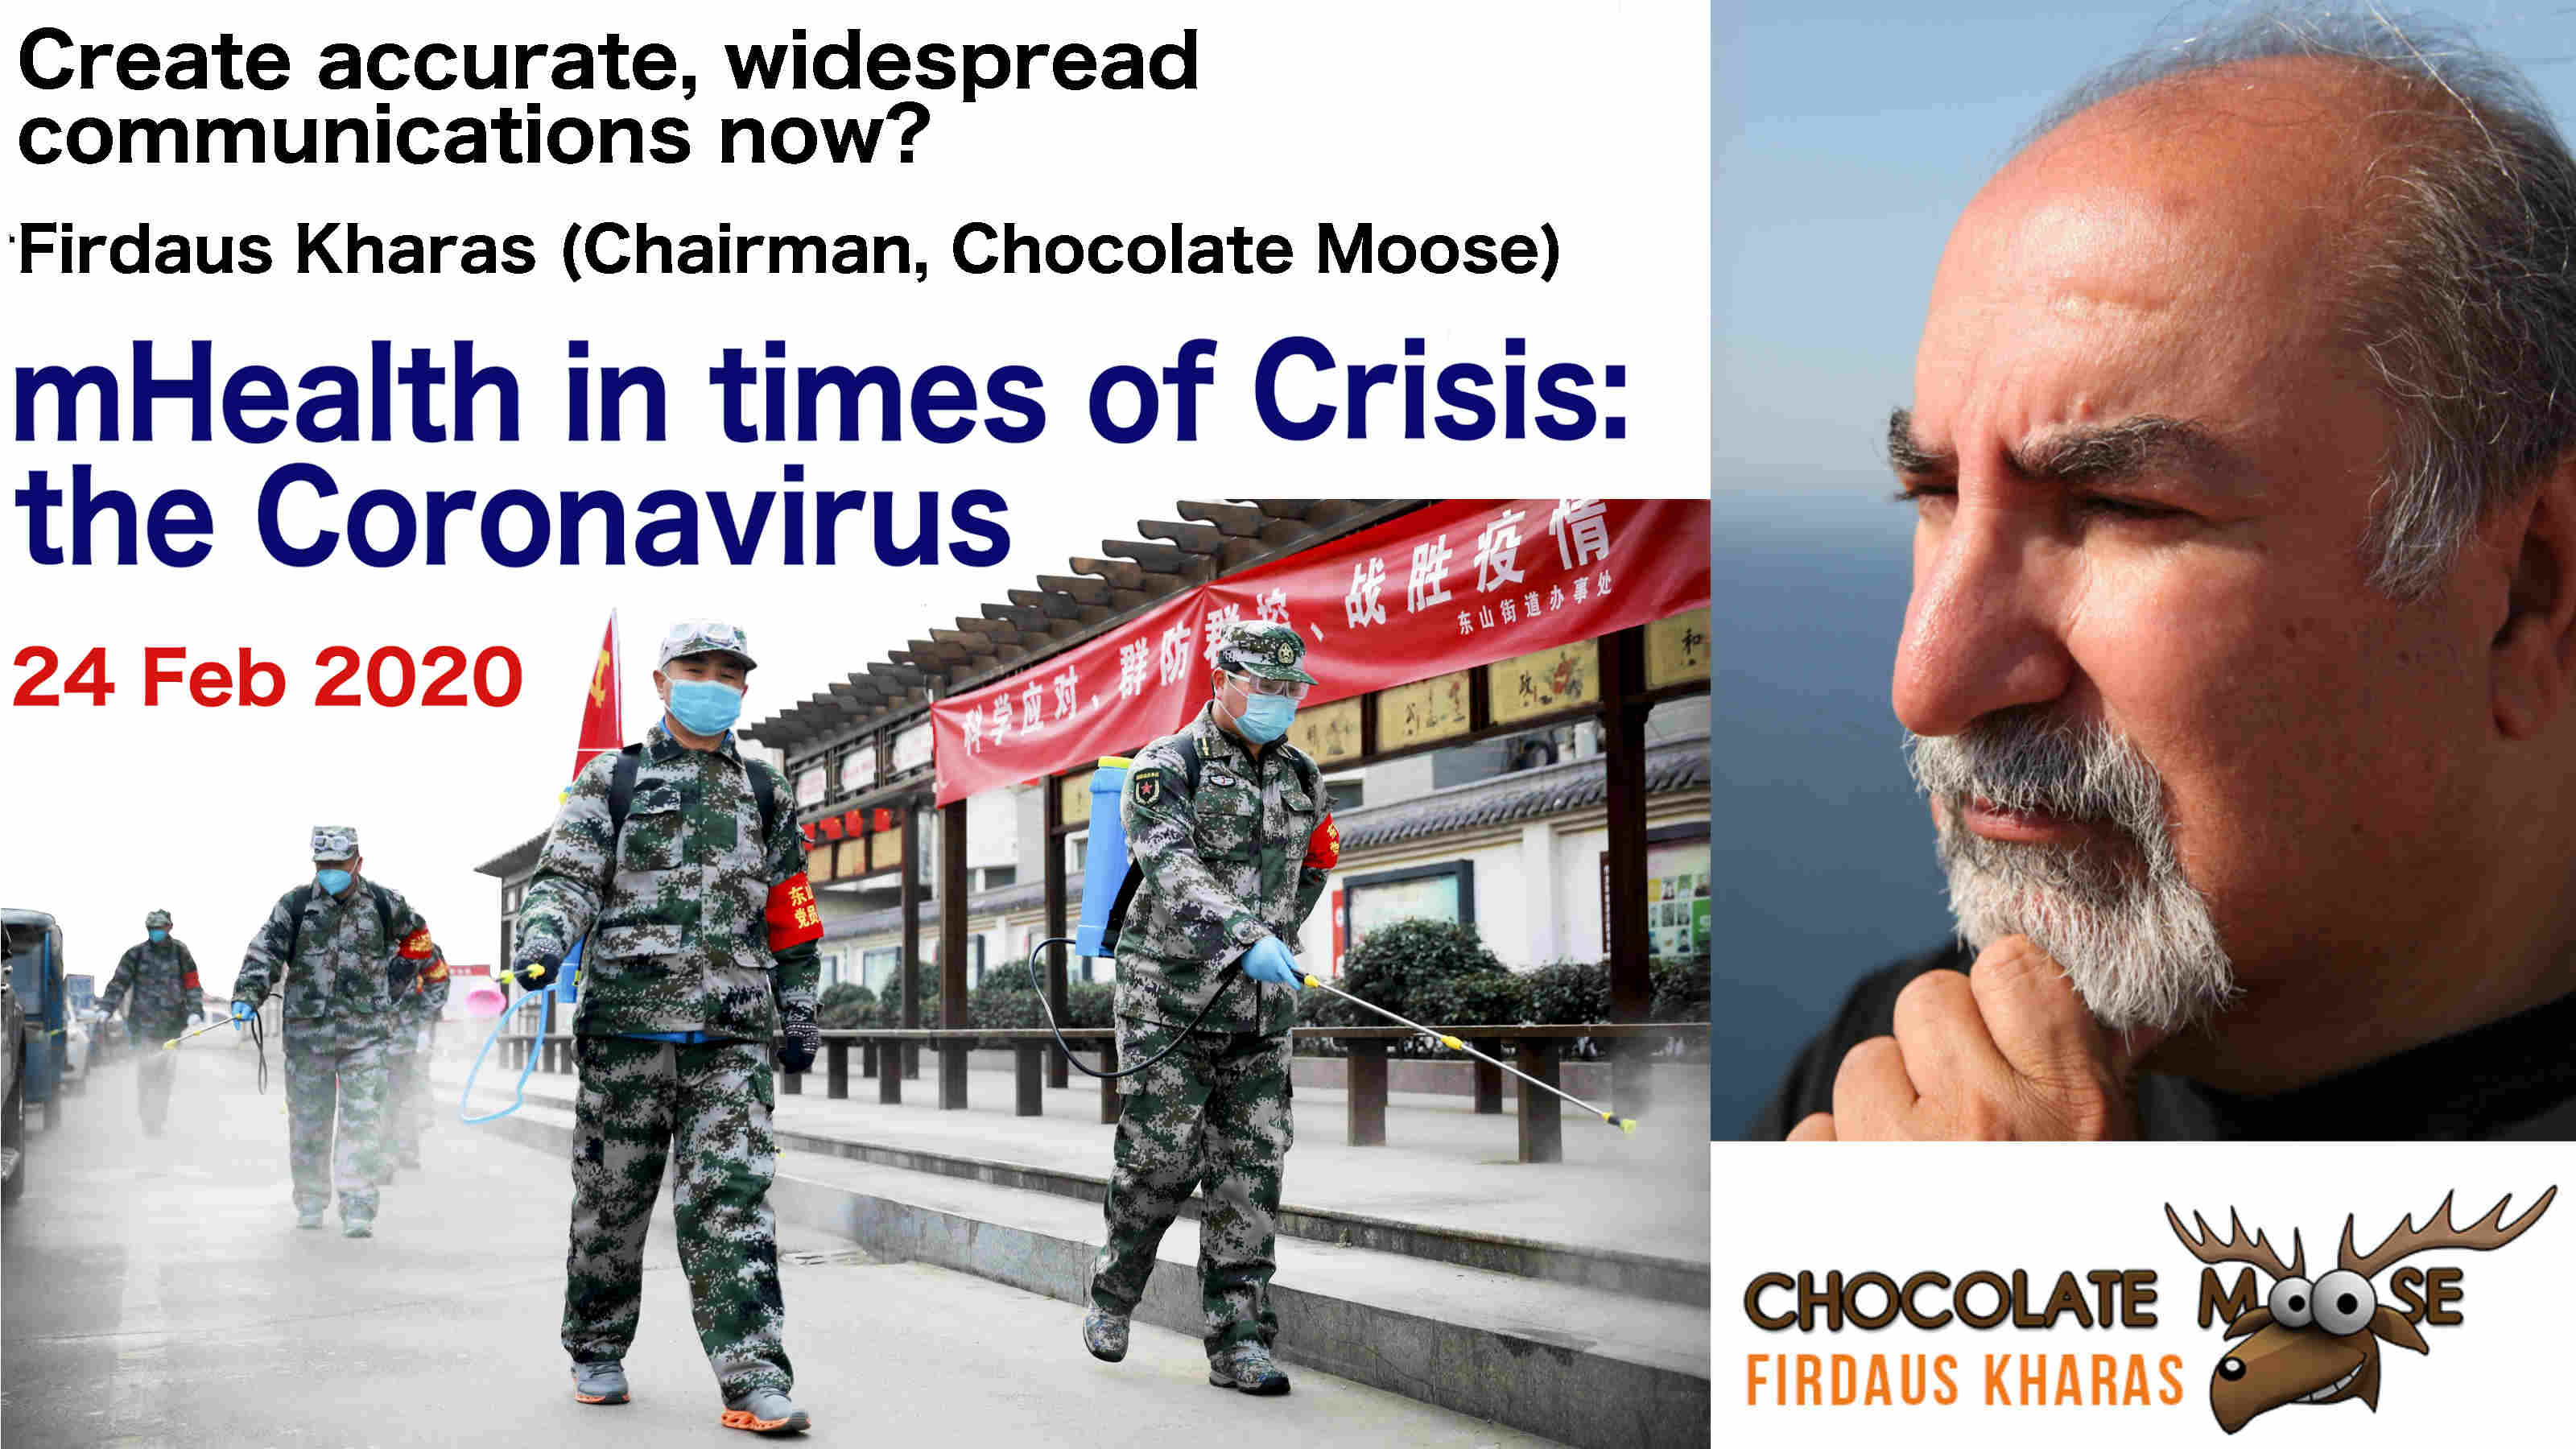 mHealth in Crisis Chocolatemoose